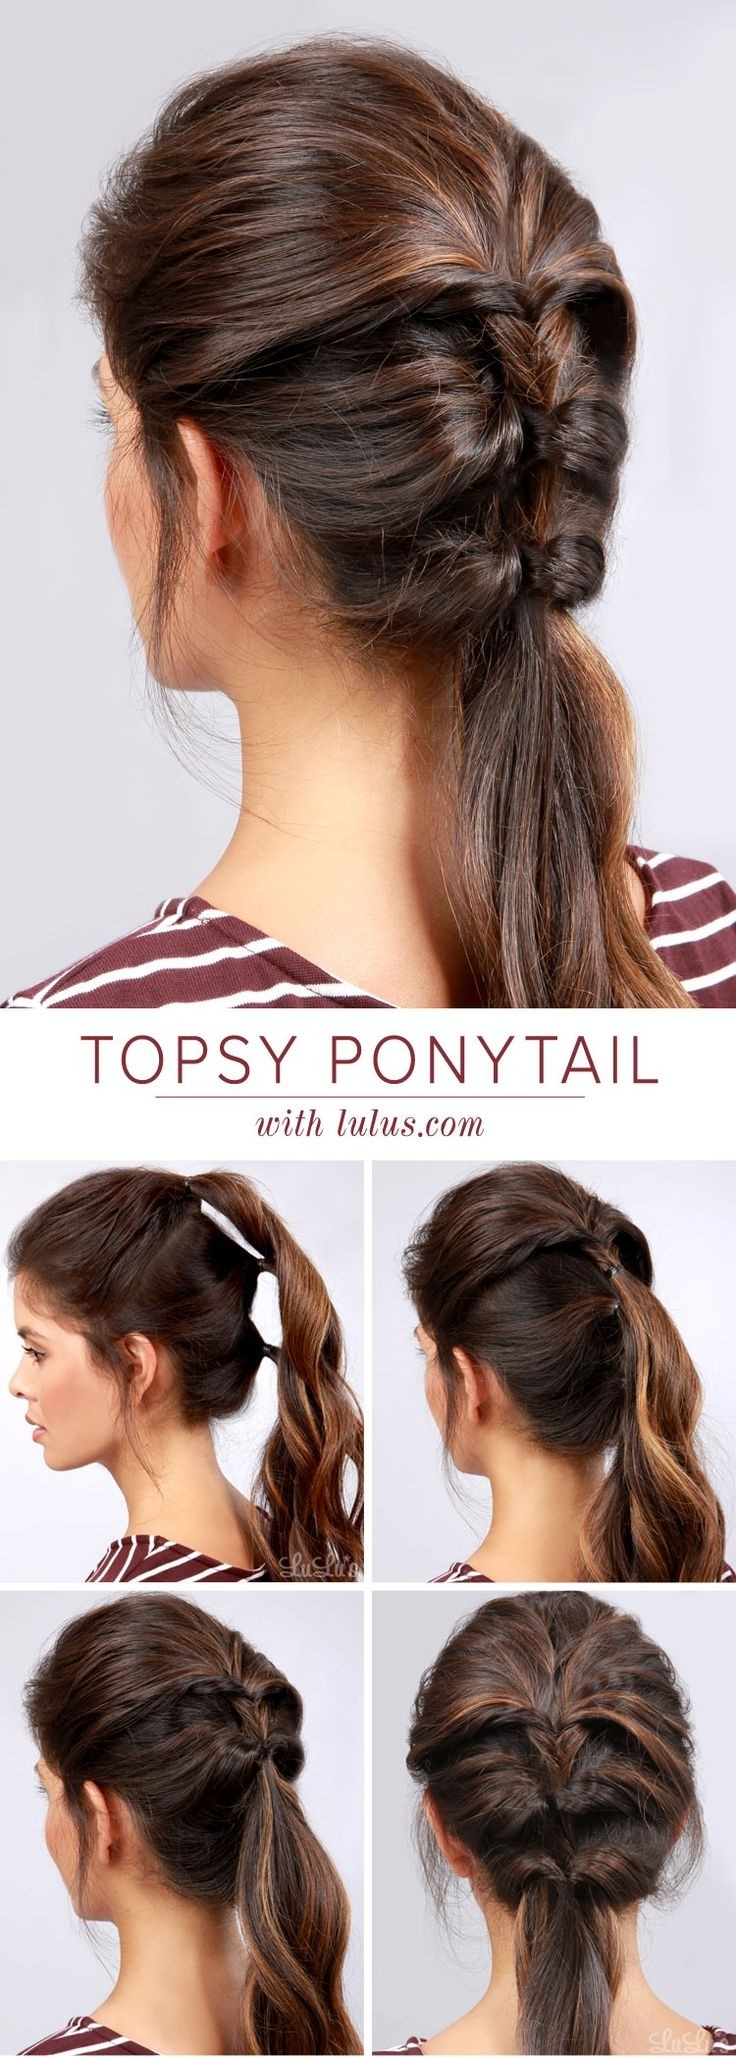 Pleasing 22 Great Ponytail Hairstyles For Girls Pretty Designs Short Hairstyles For Black Women Fulllsitofus